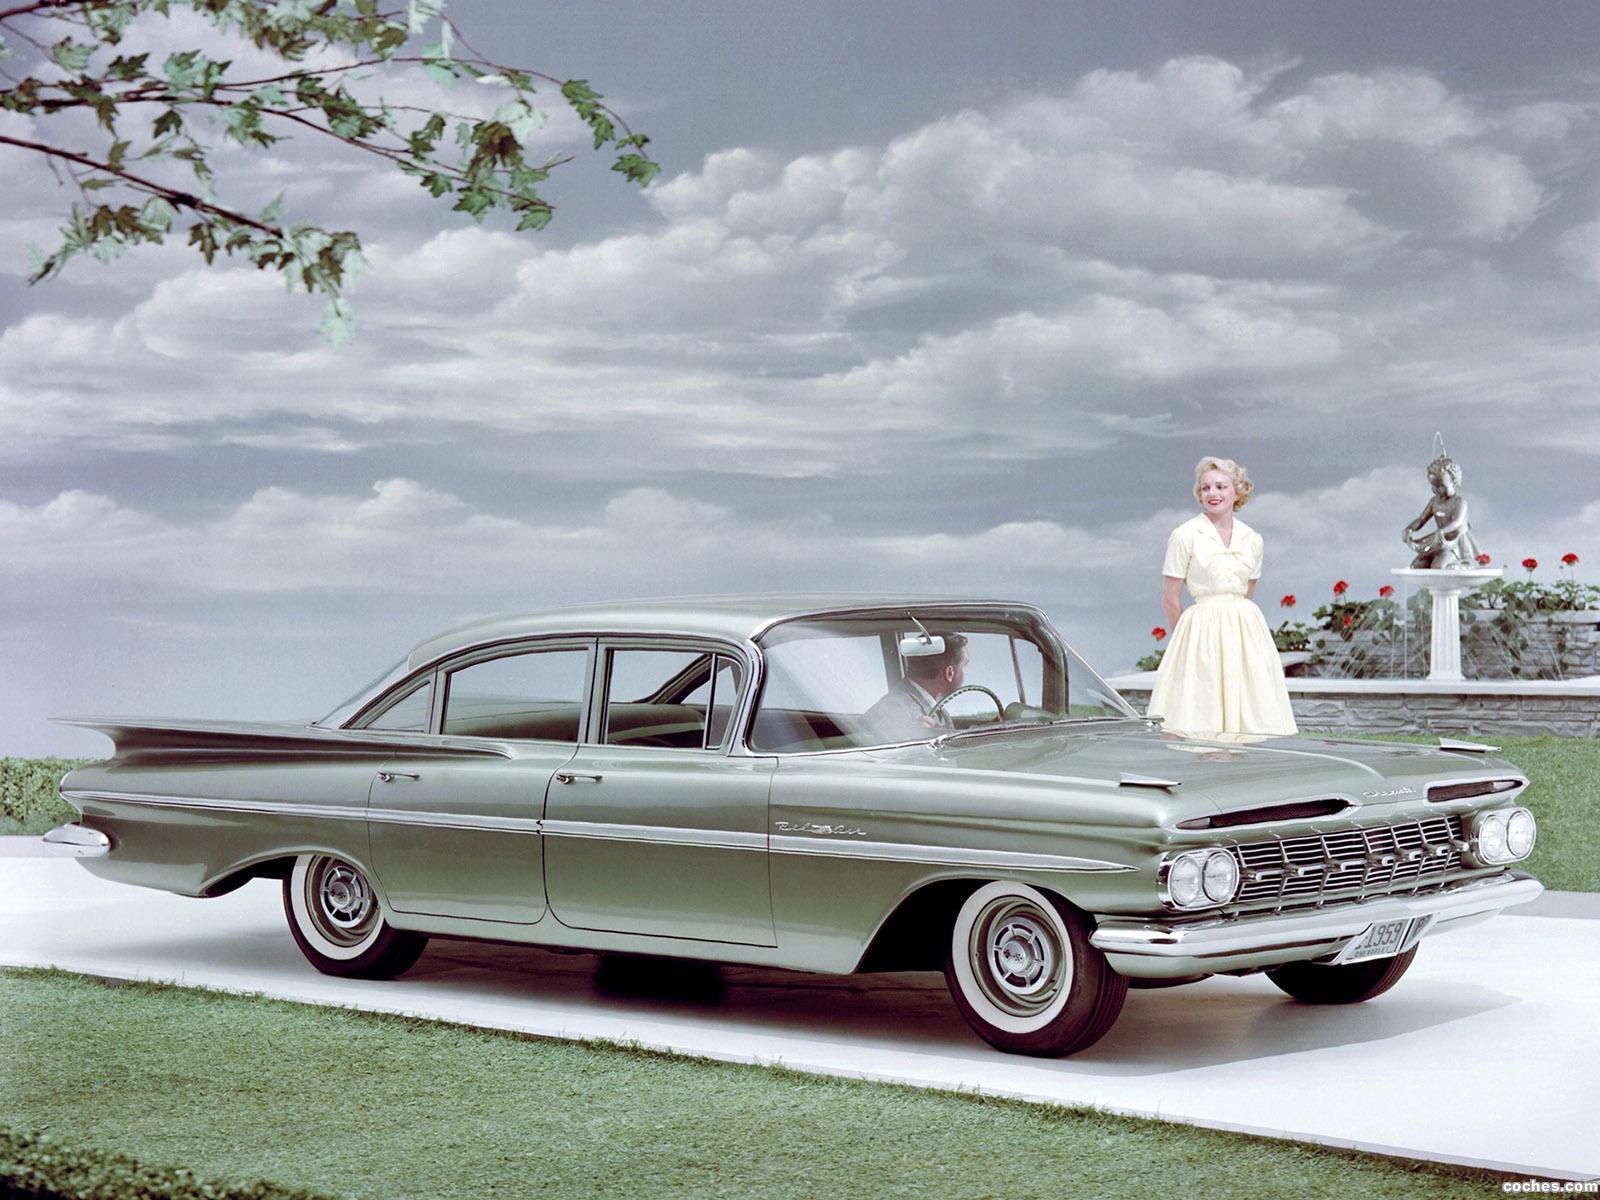 fotos de chevrolet bel air 4 puertas sedan 1959. Black Bedroom Furniture Sets. Home Design Ideas